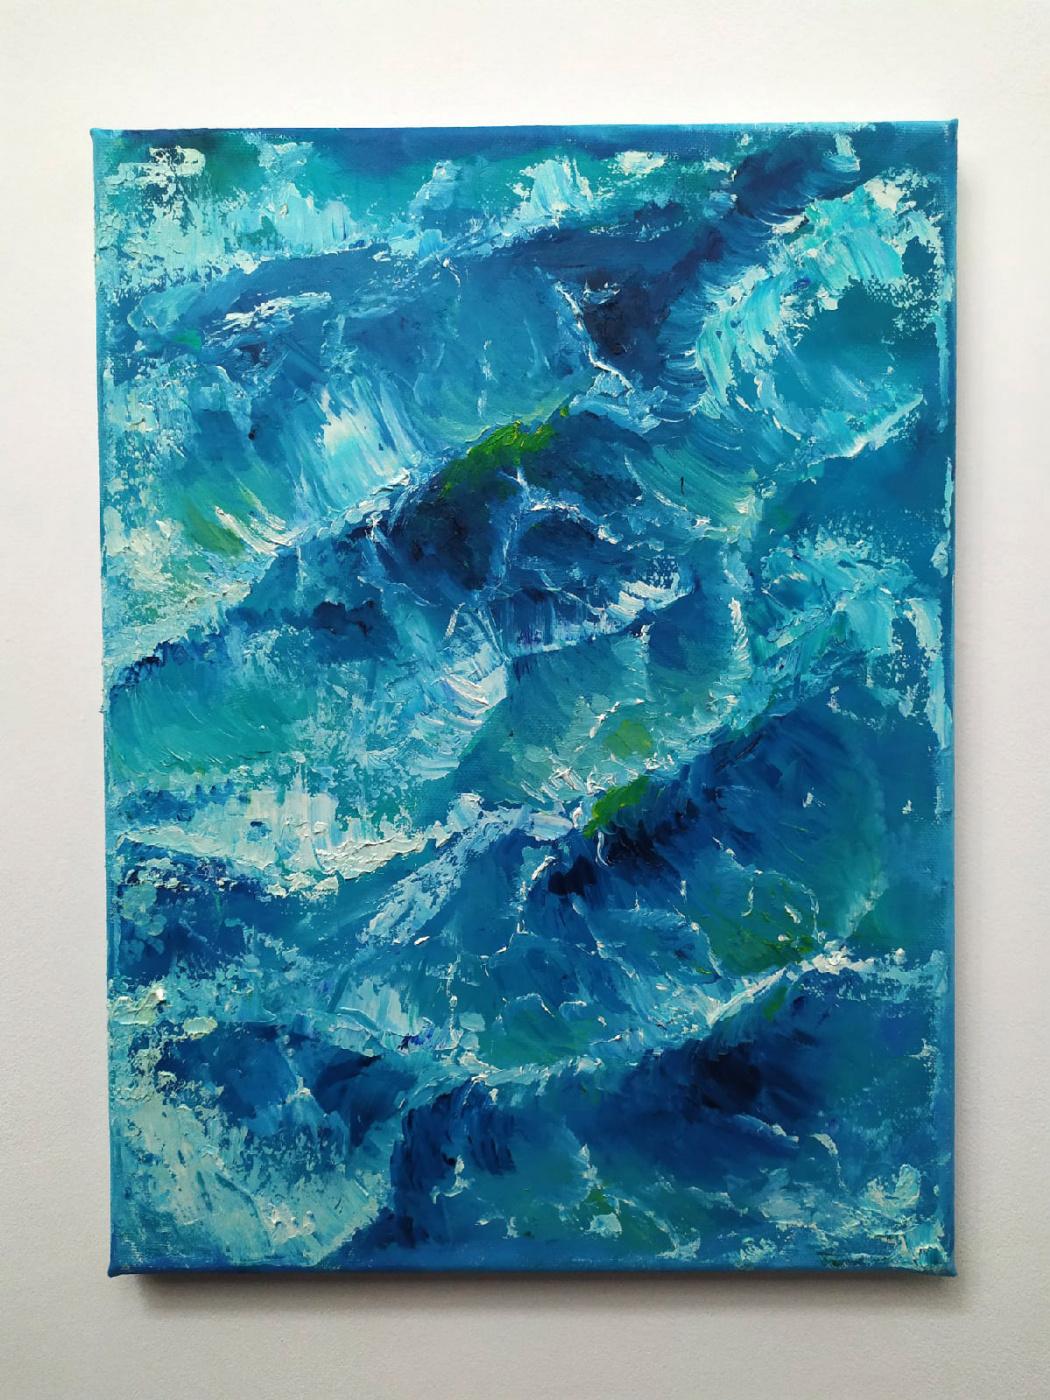 Anya Valerievna Podlesnova. Waves